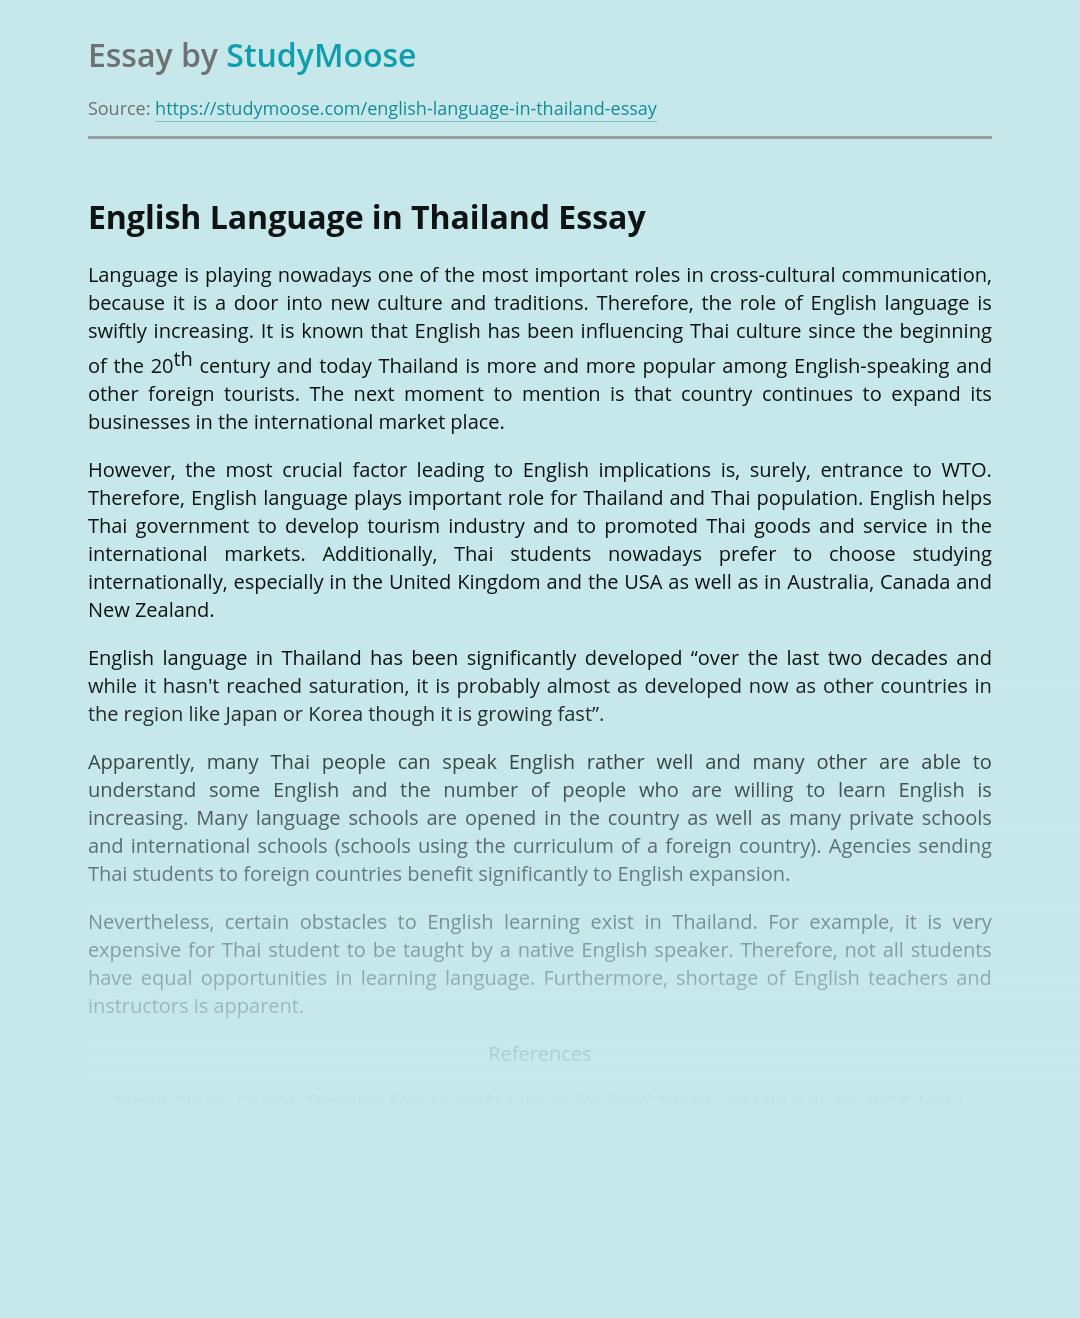 English Language in Thailand